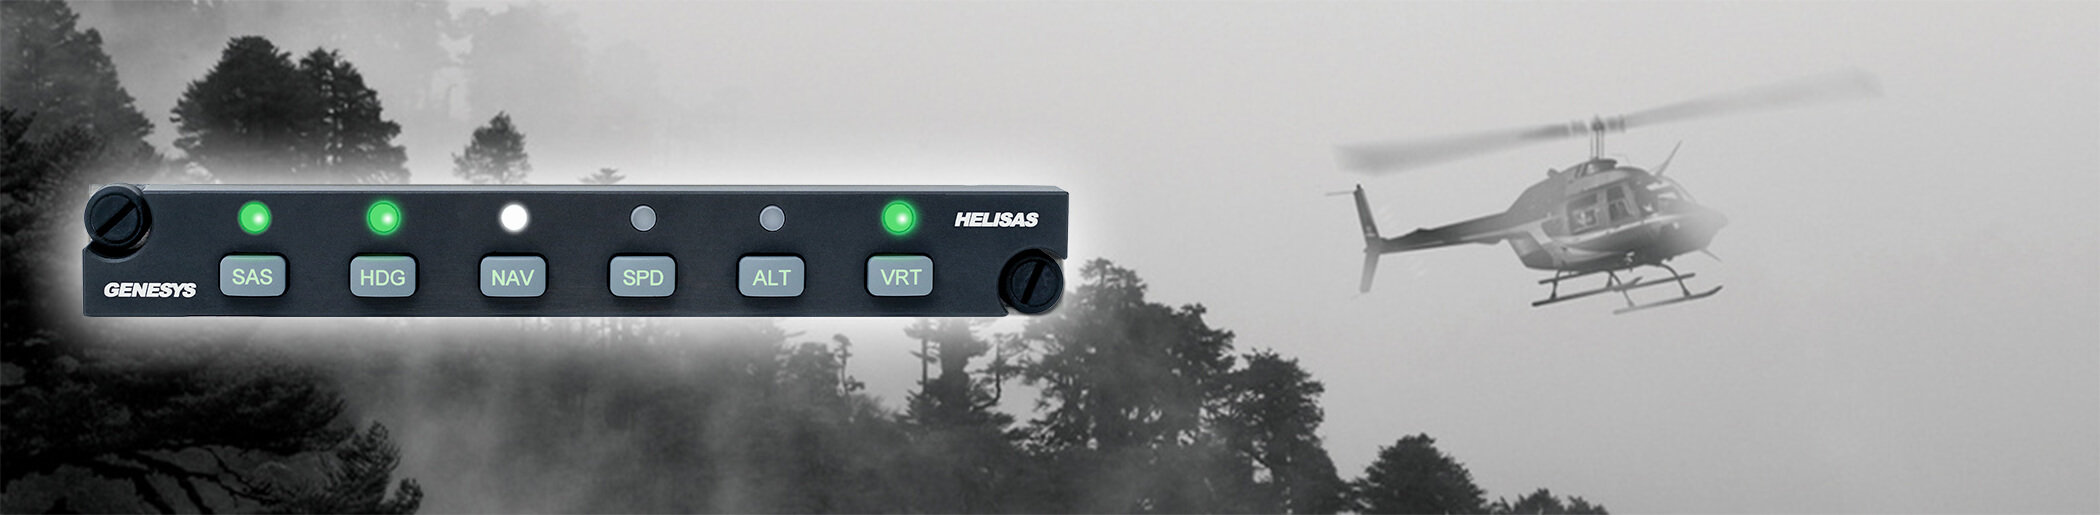 Genesys HeliSAS Autopilot and Stability Augmentation System